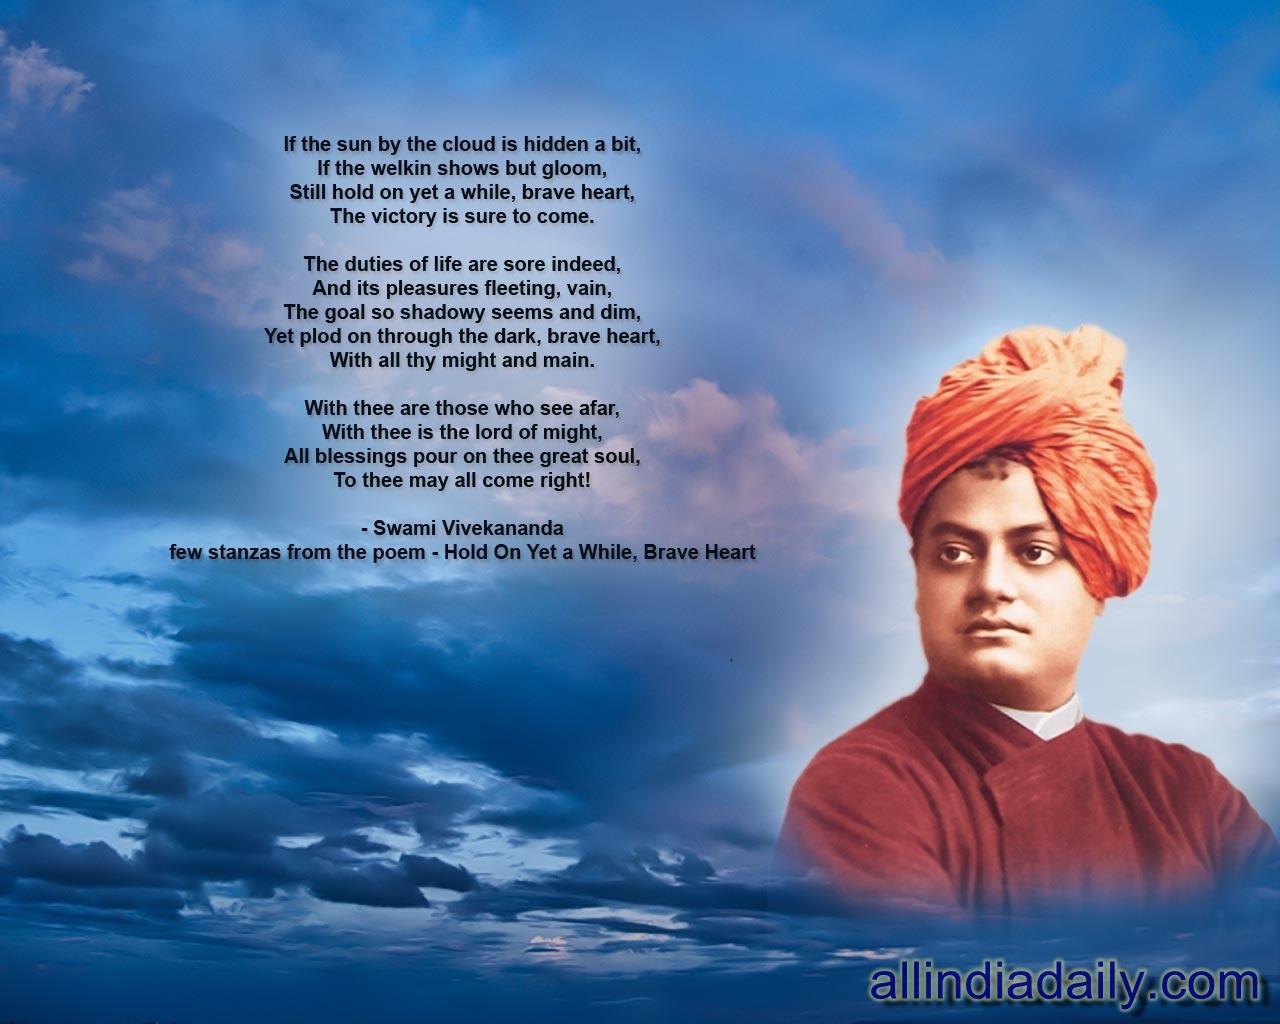 Universal brotherhood is more valuable than patriotism india